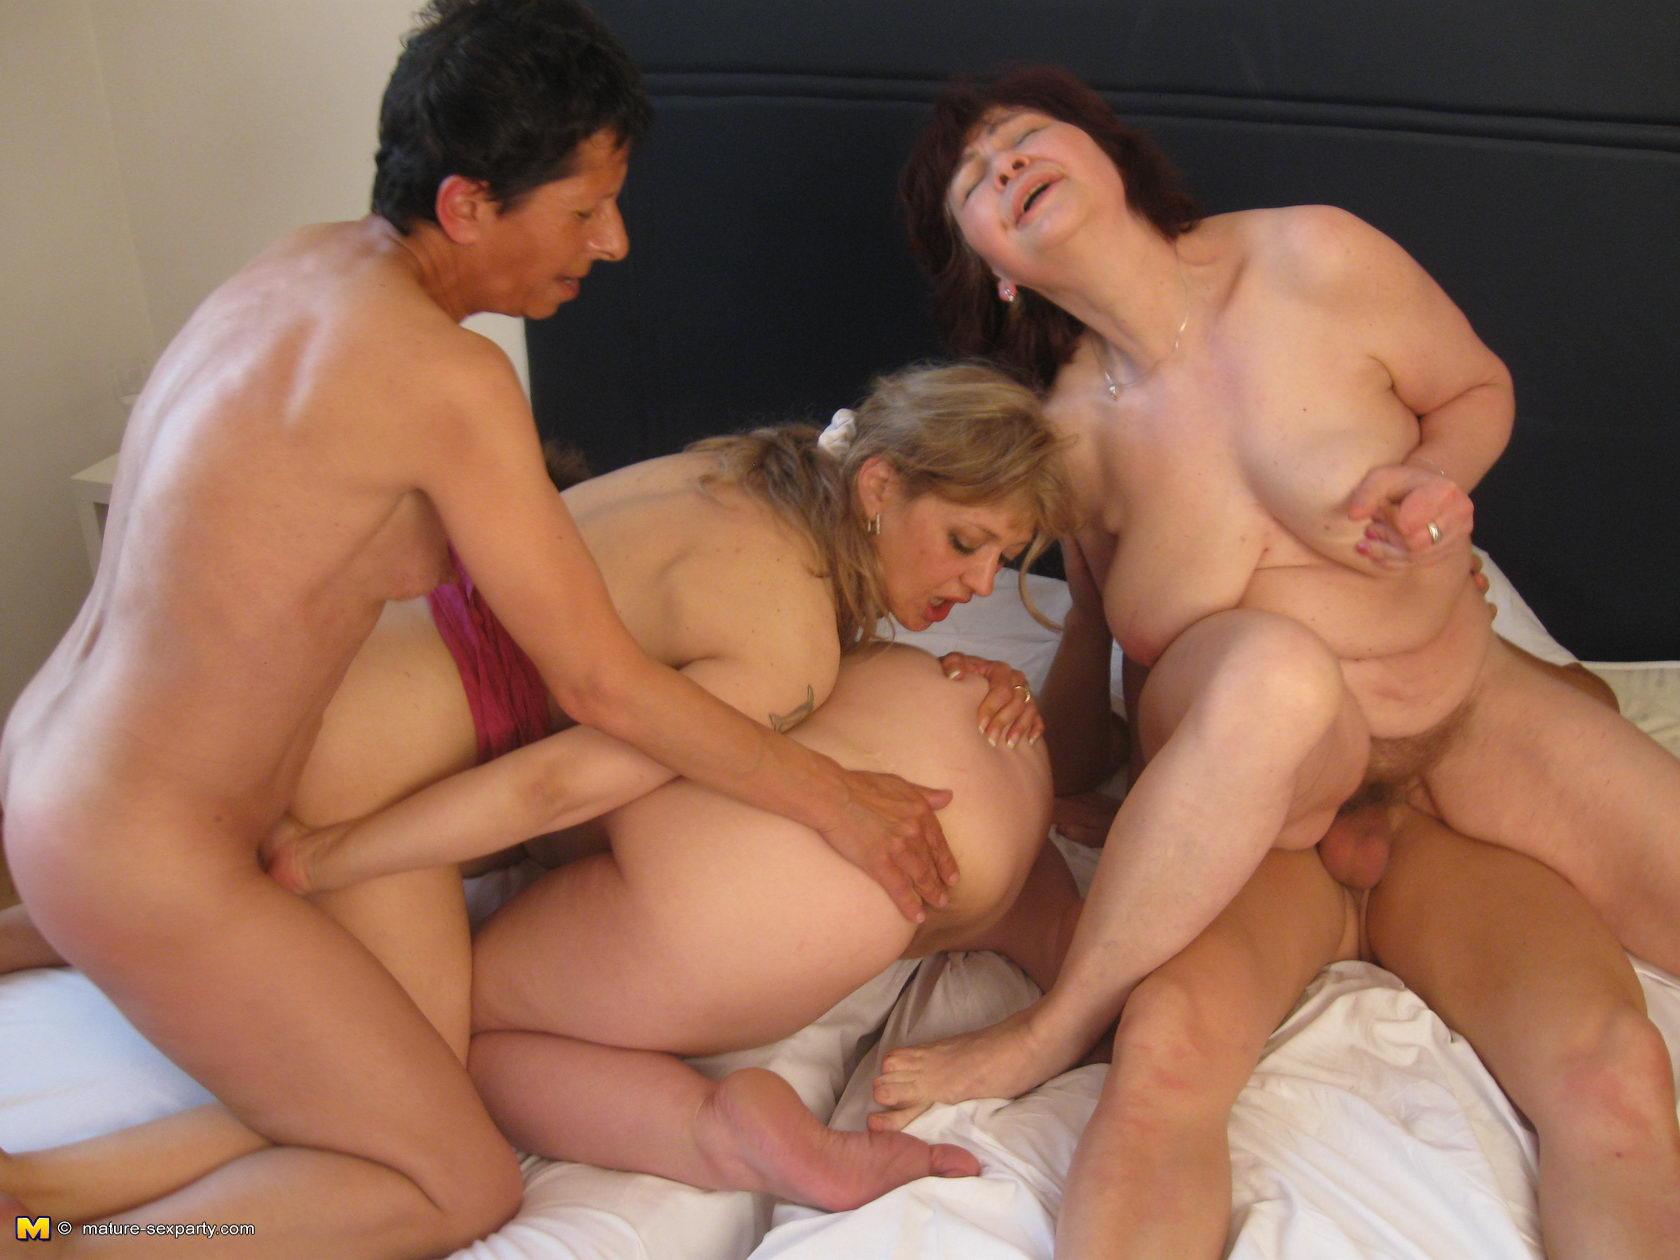 Старики исторушки порно 23 фотография